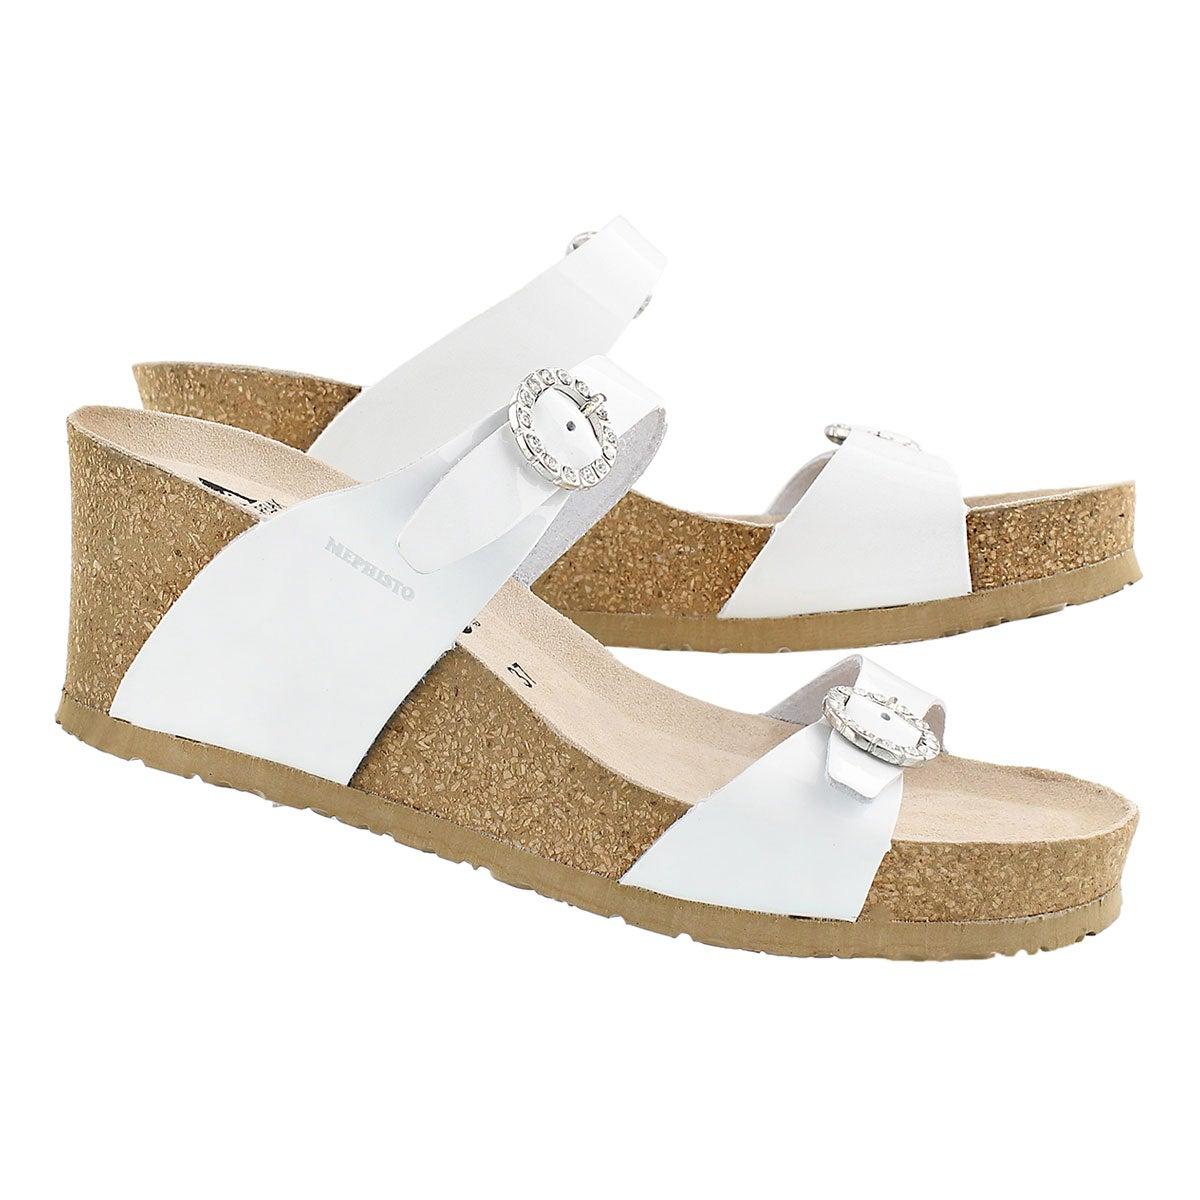 Sandale LIDIA, cuir verni blanc, femmes